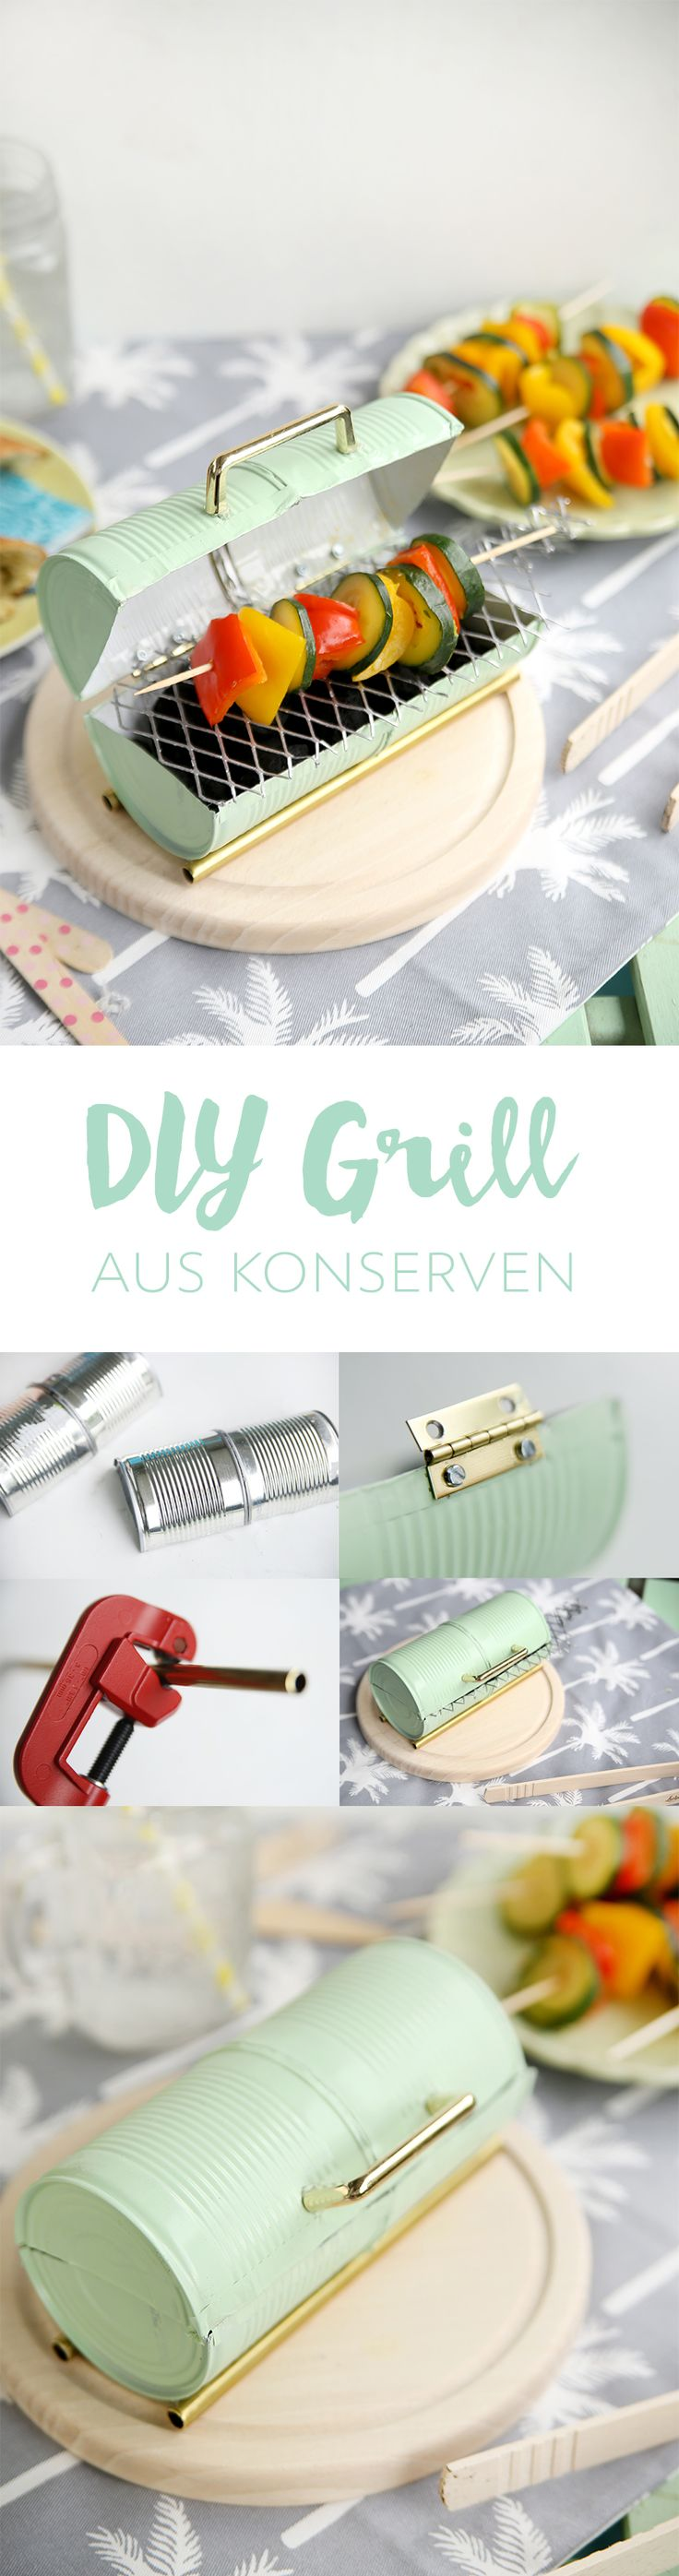 kreative diy idee zum selbermachen mini grill basteln aus konservendosen upcycling - Kreative Ideen Diy